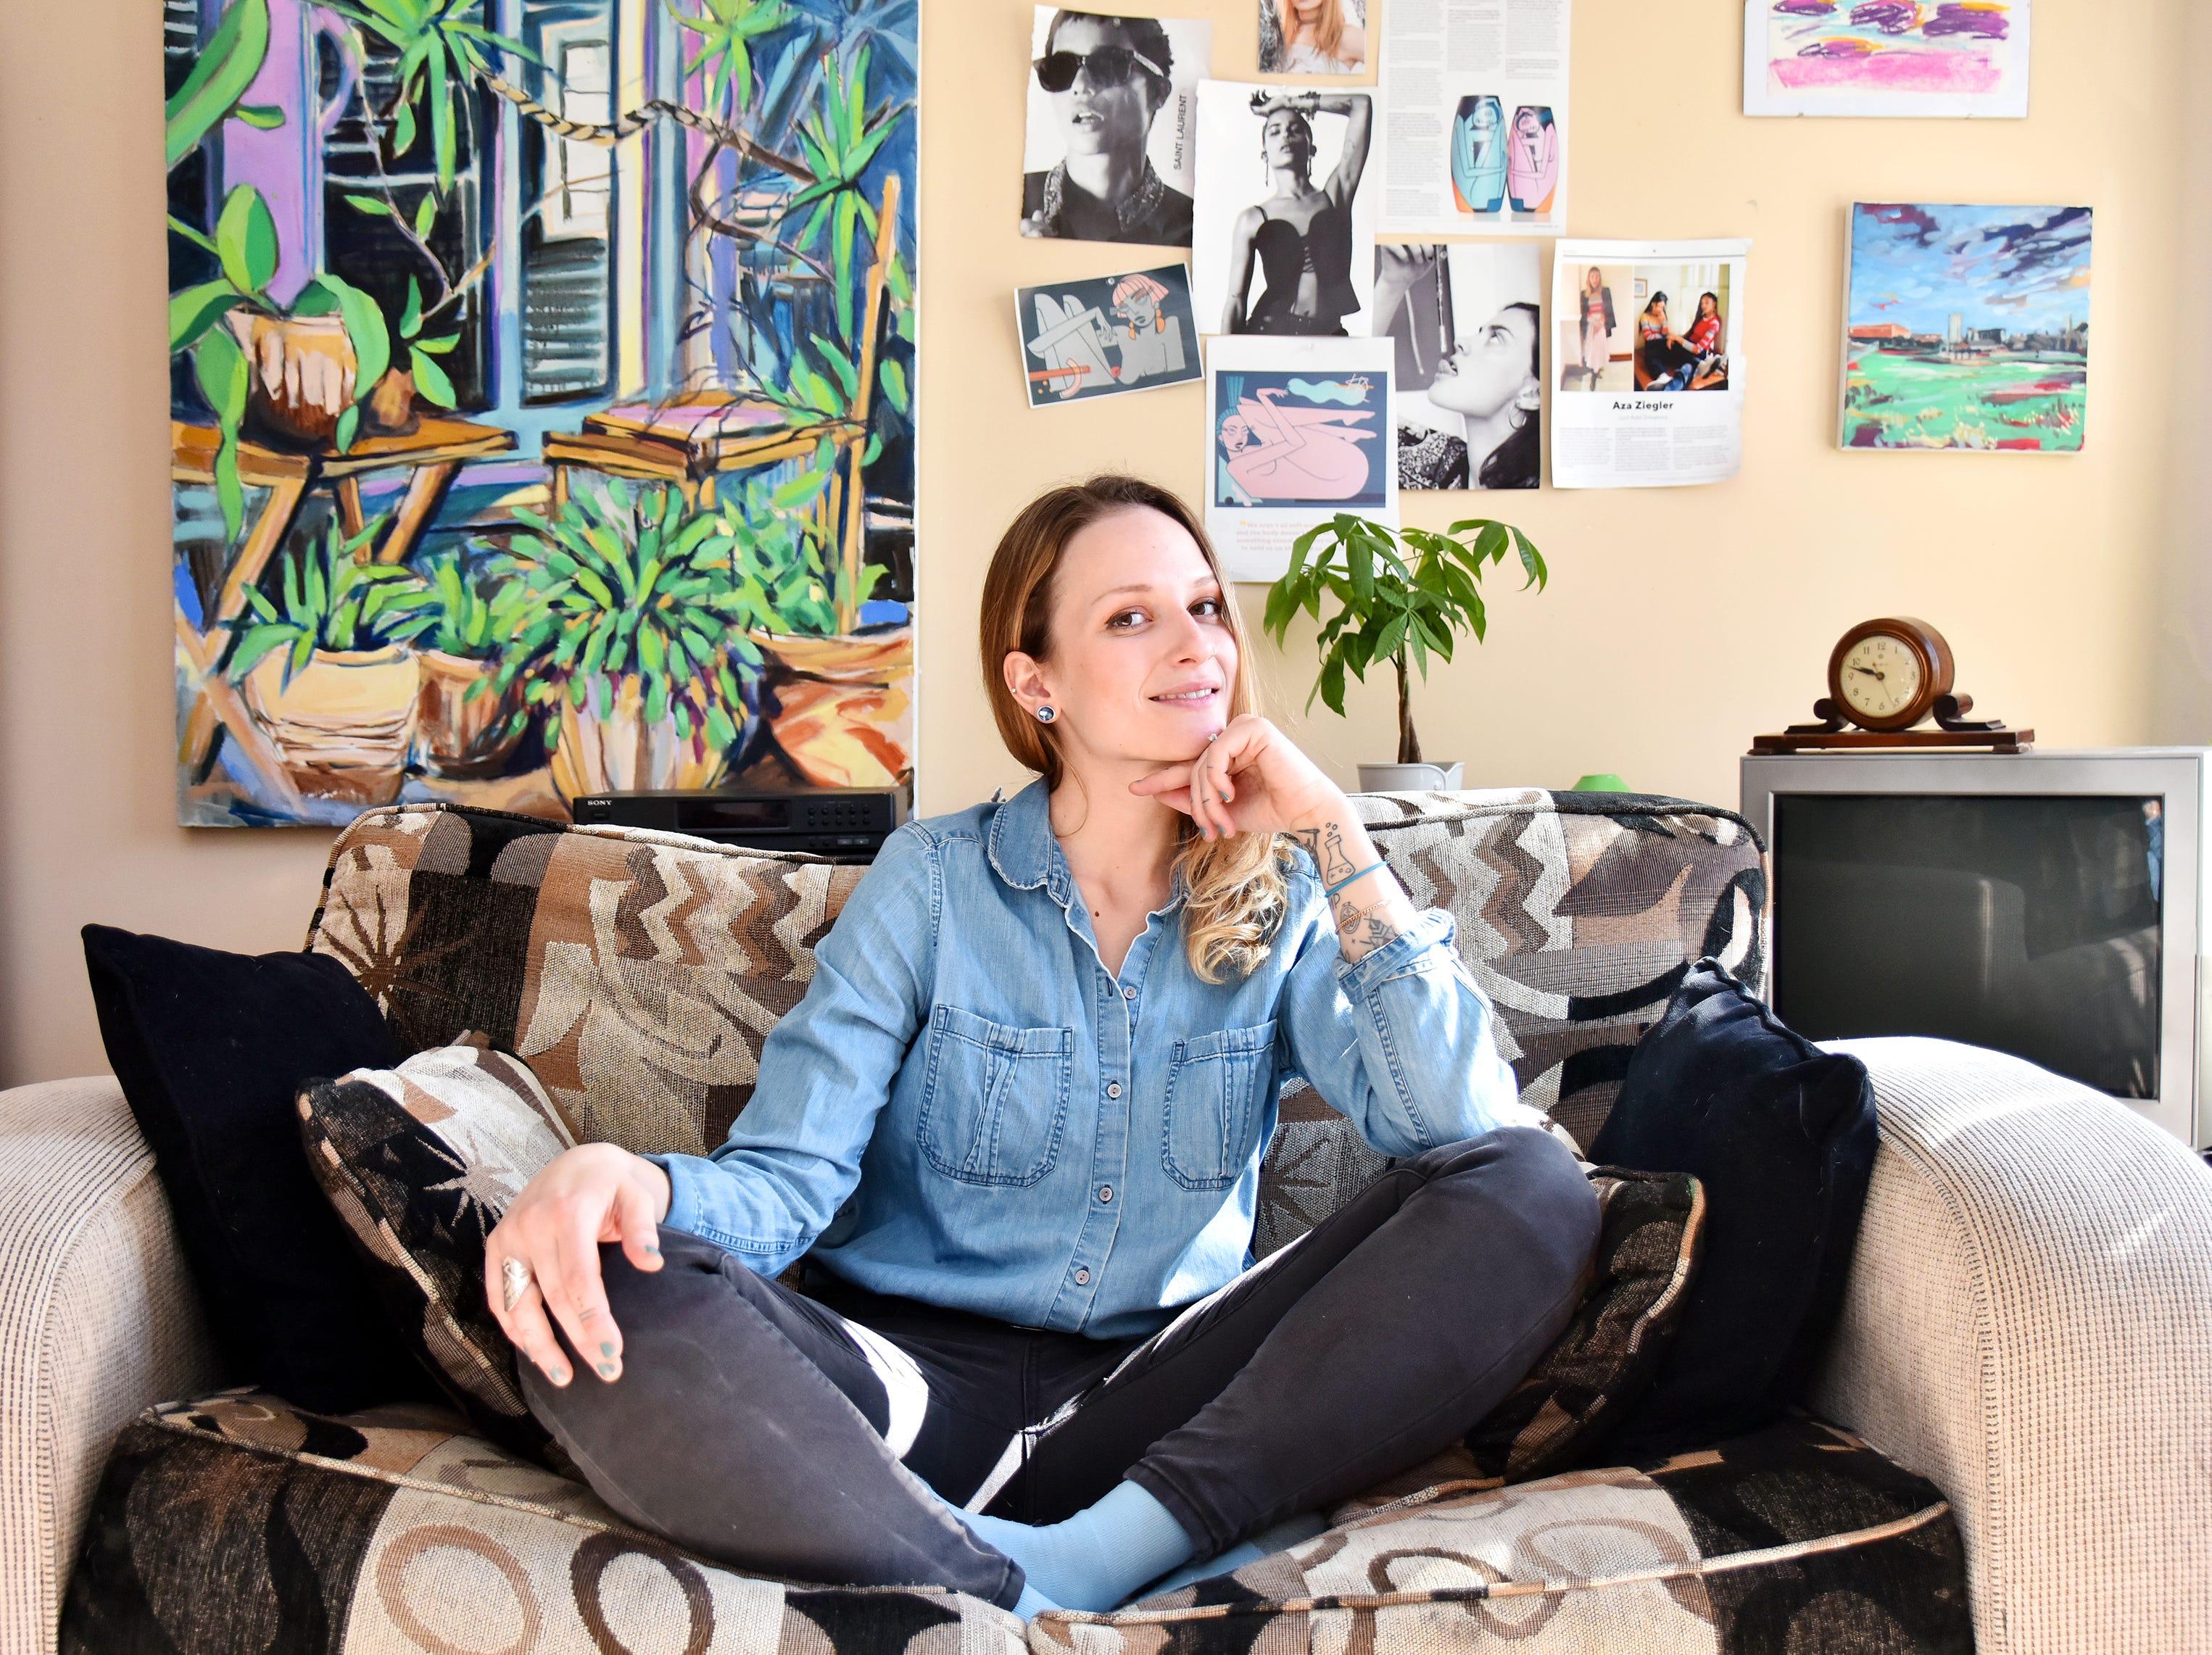 Artist Tatyana Grechina in her workspace.